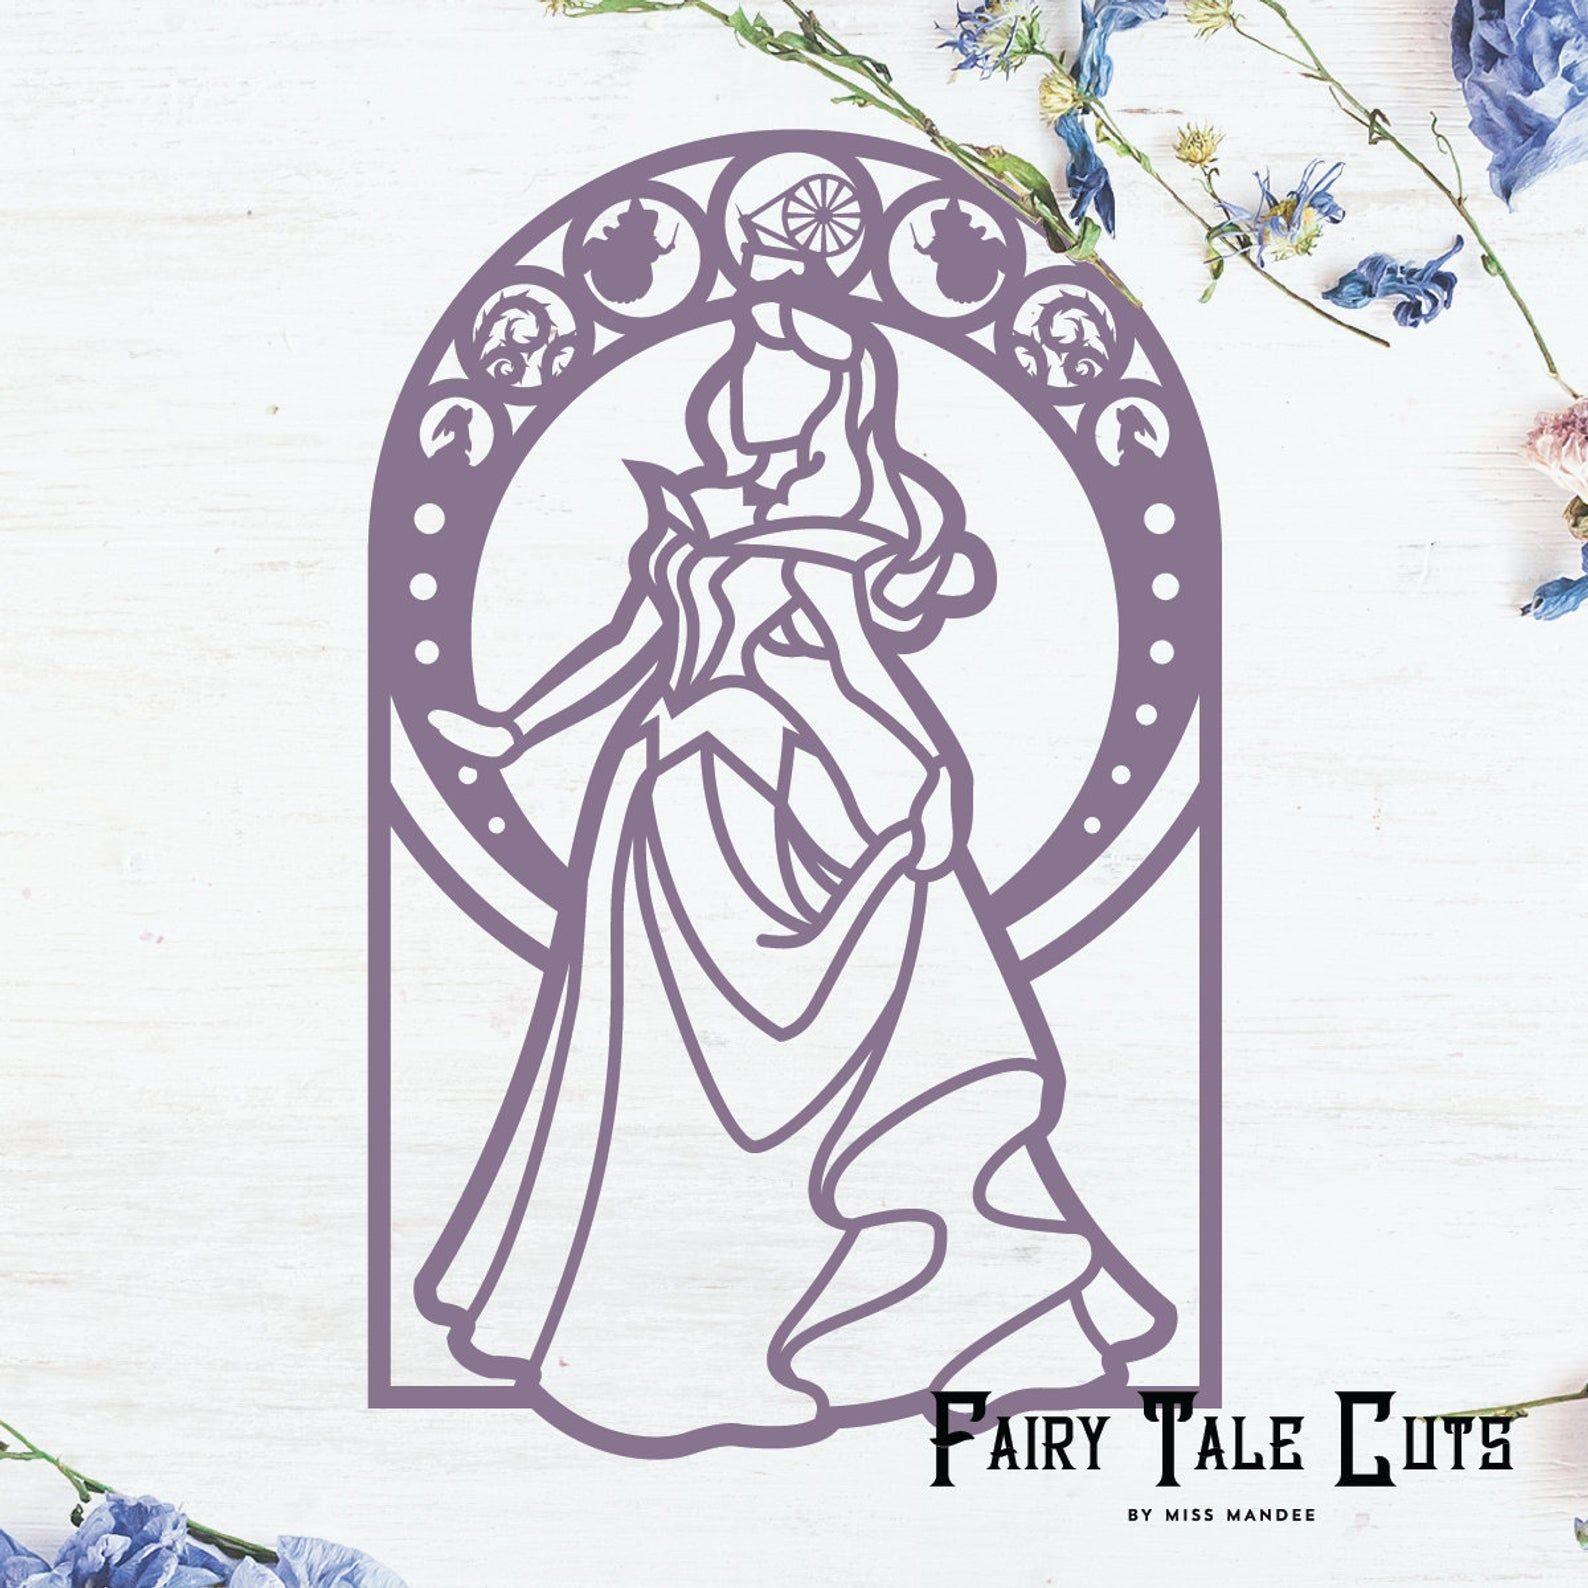 Sleeping Beauty Inspired File Design Digital Download